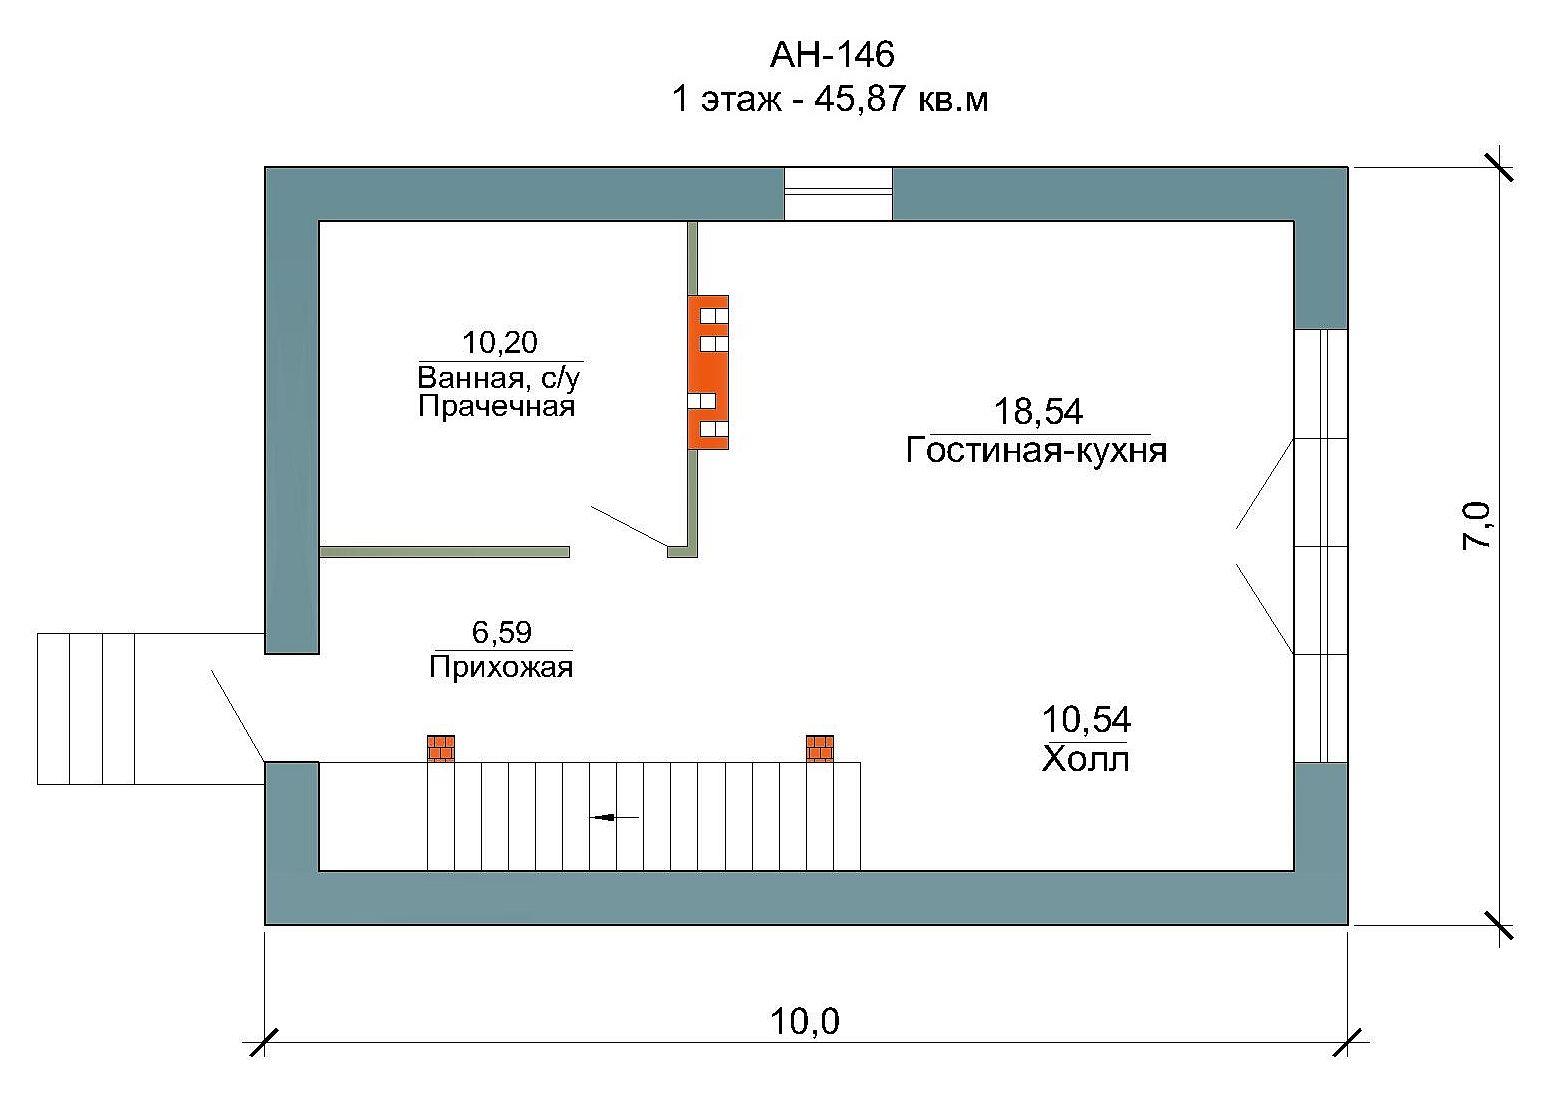 Готовый проект дома 97 кв.м // Артикул АН-146 план